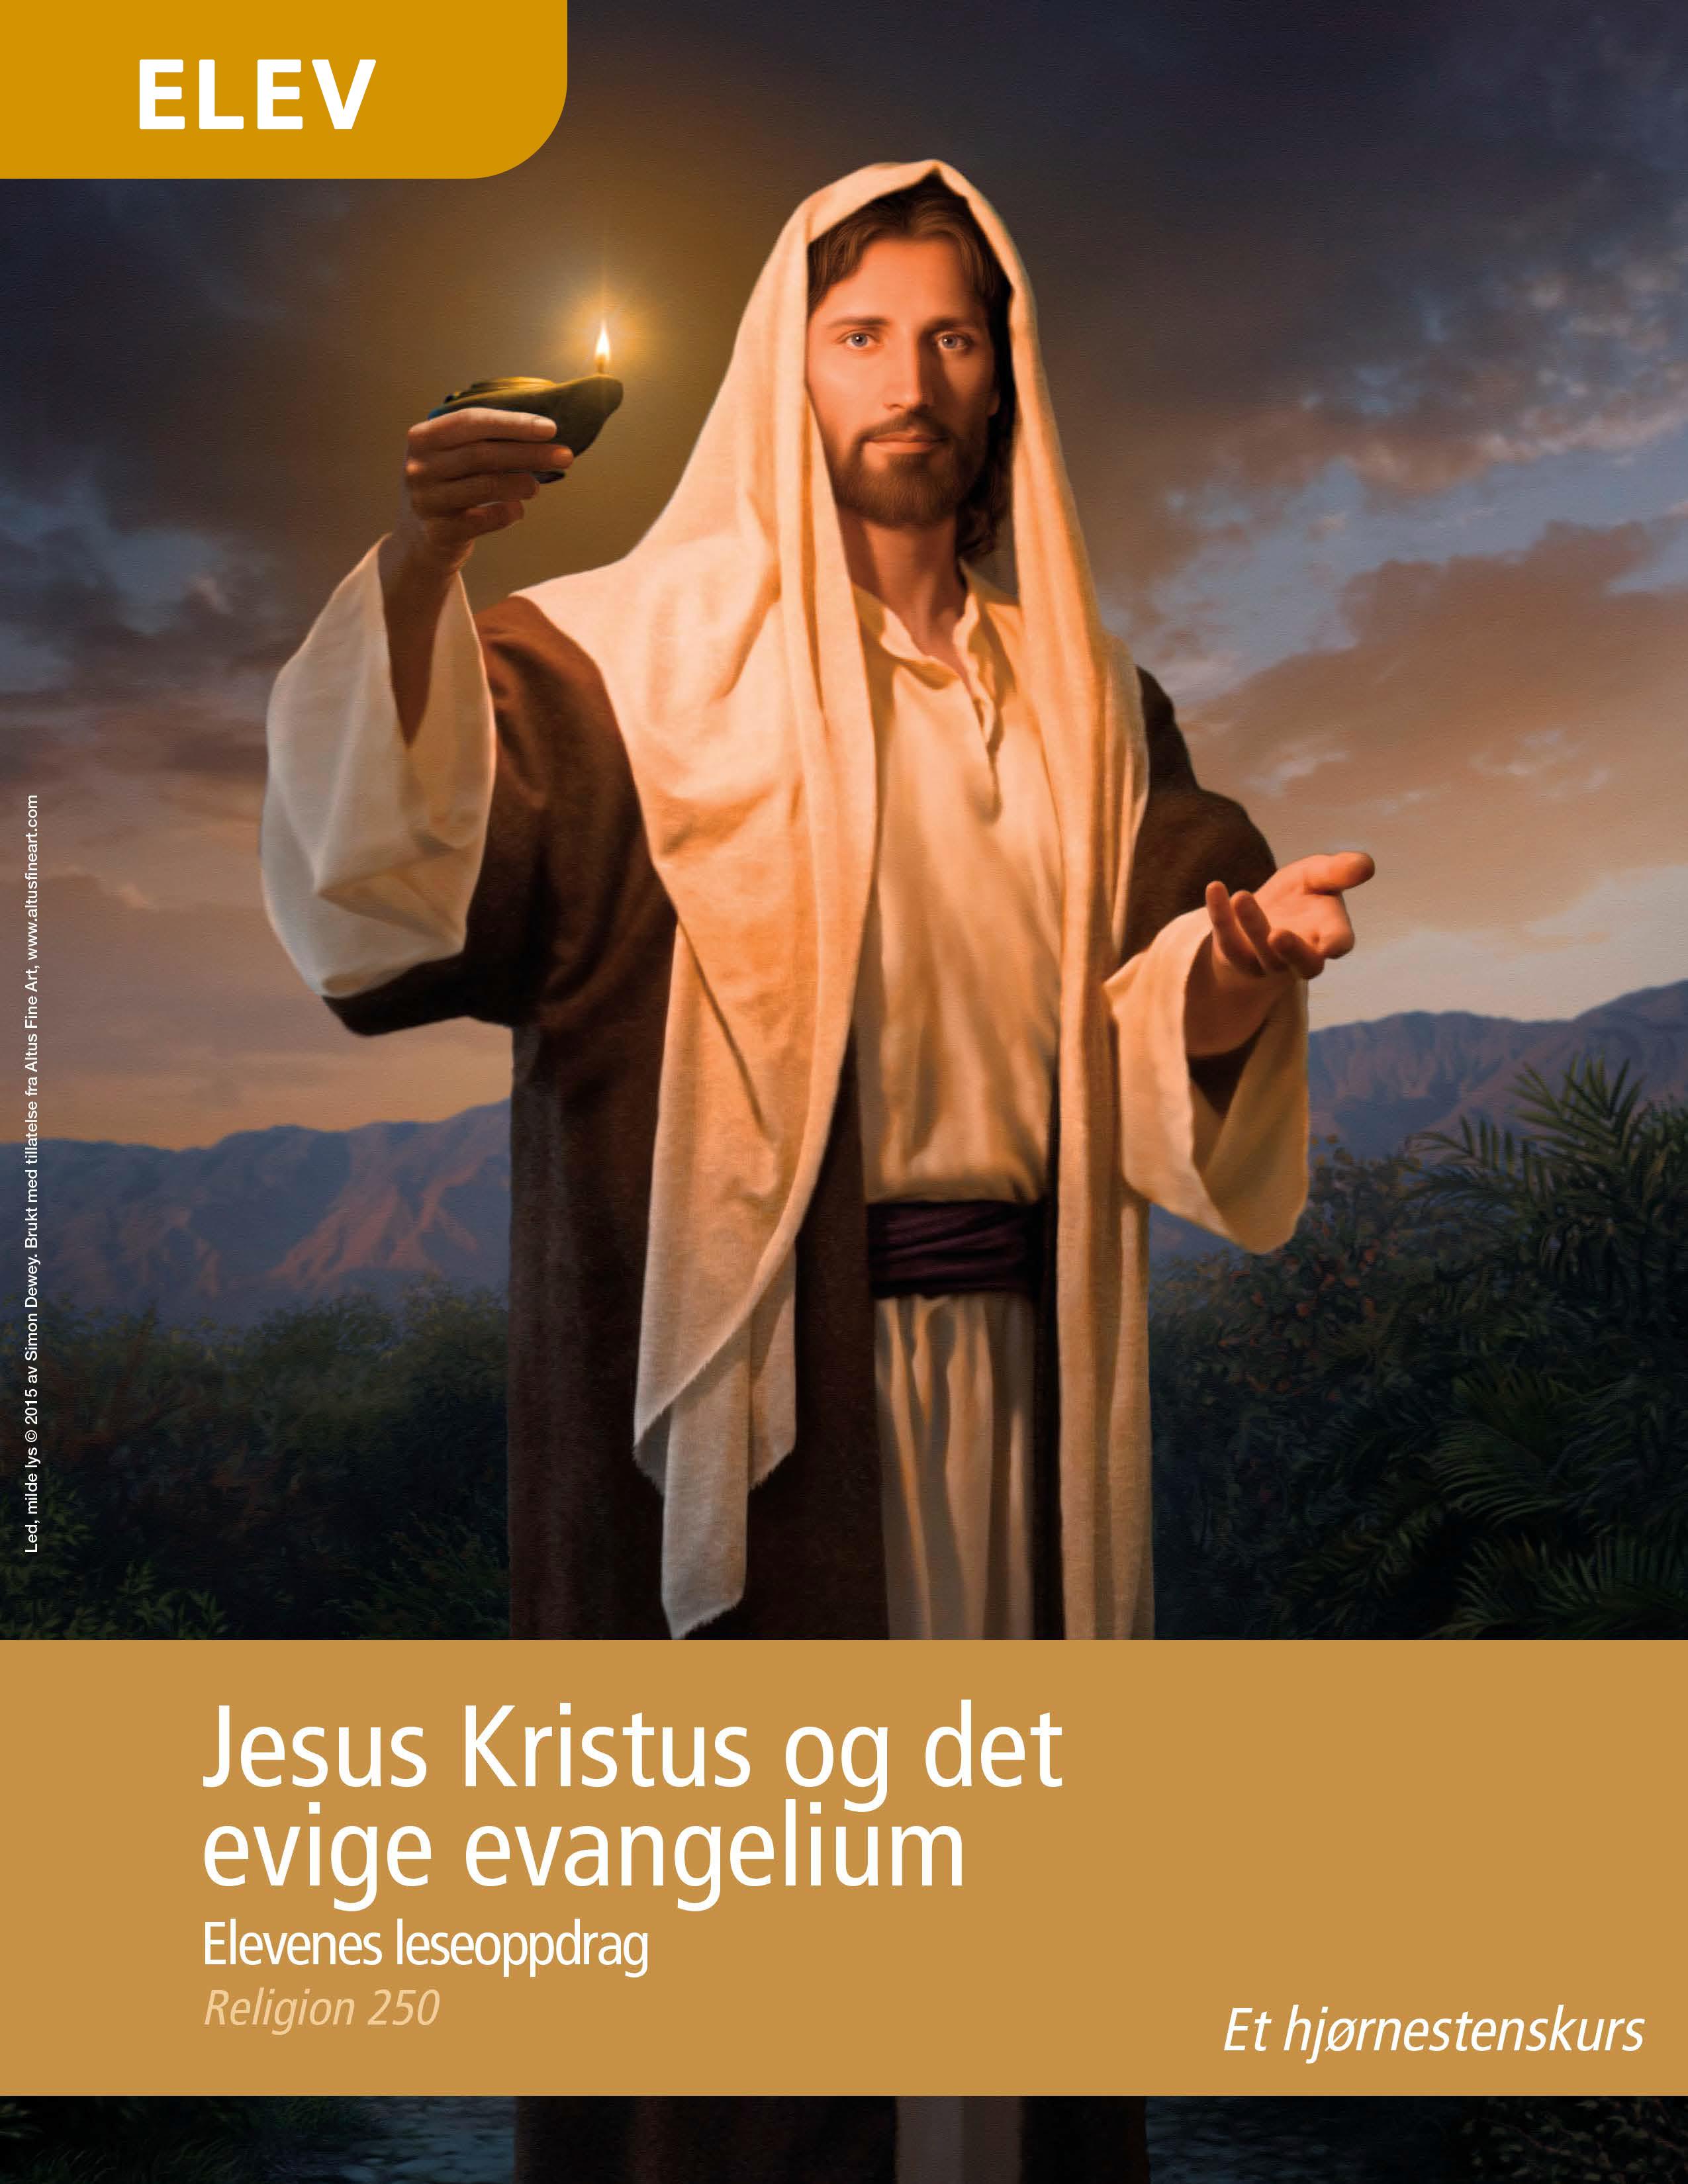 Jesus Kristus og det evige evangelium – Elevenes leseoppdrag (Religion 250)